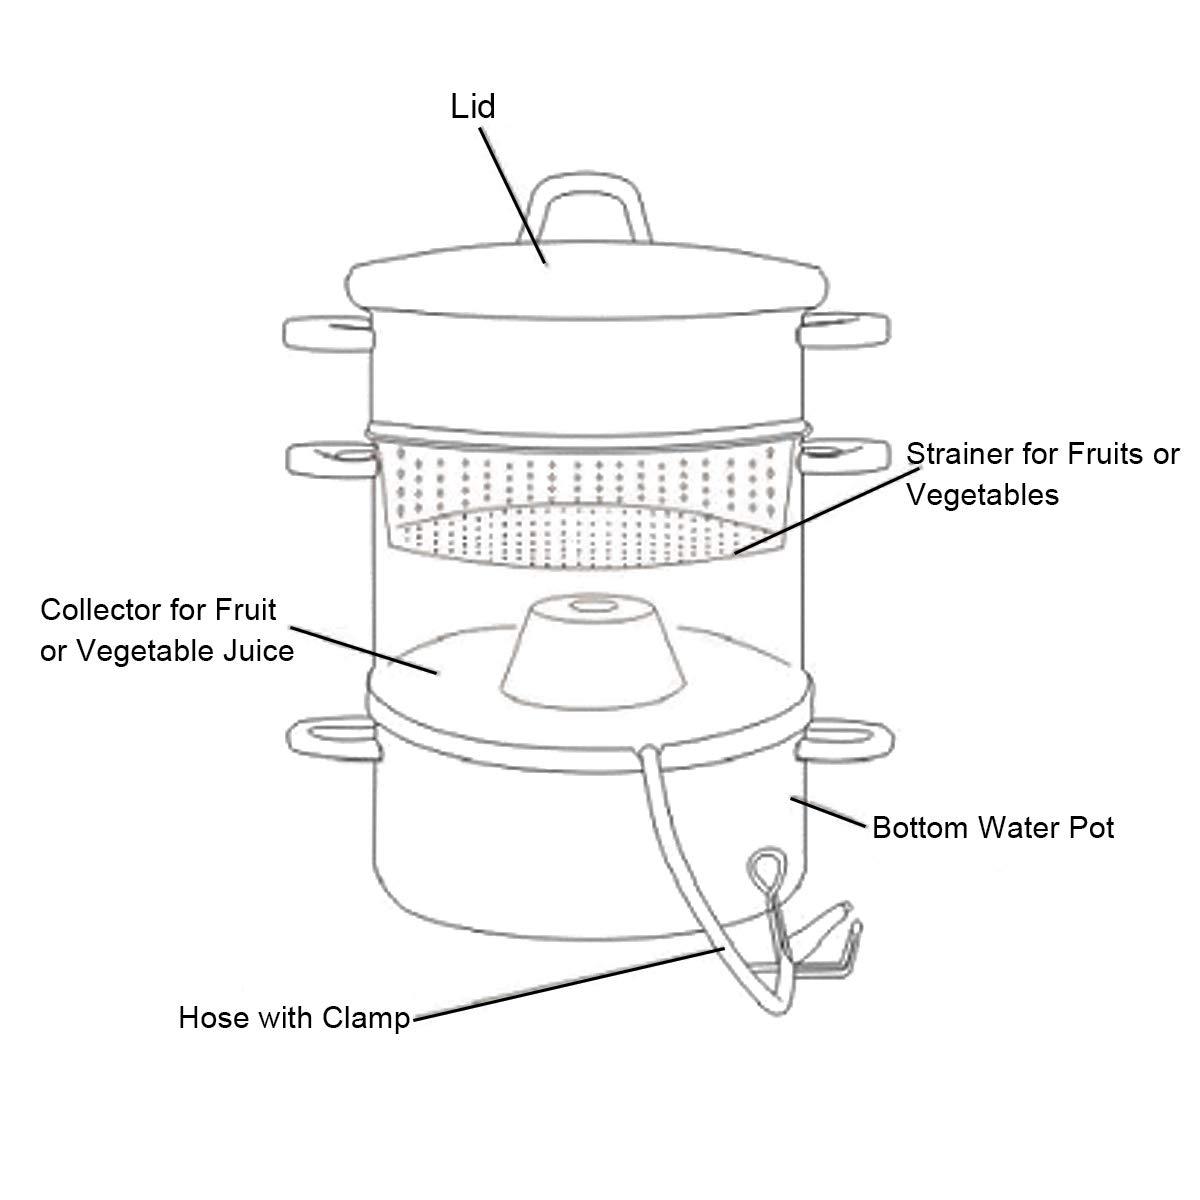 Amazon.com: Giantex 11 Quart Juice vaporizador de frutas y ...